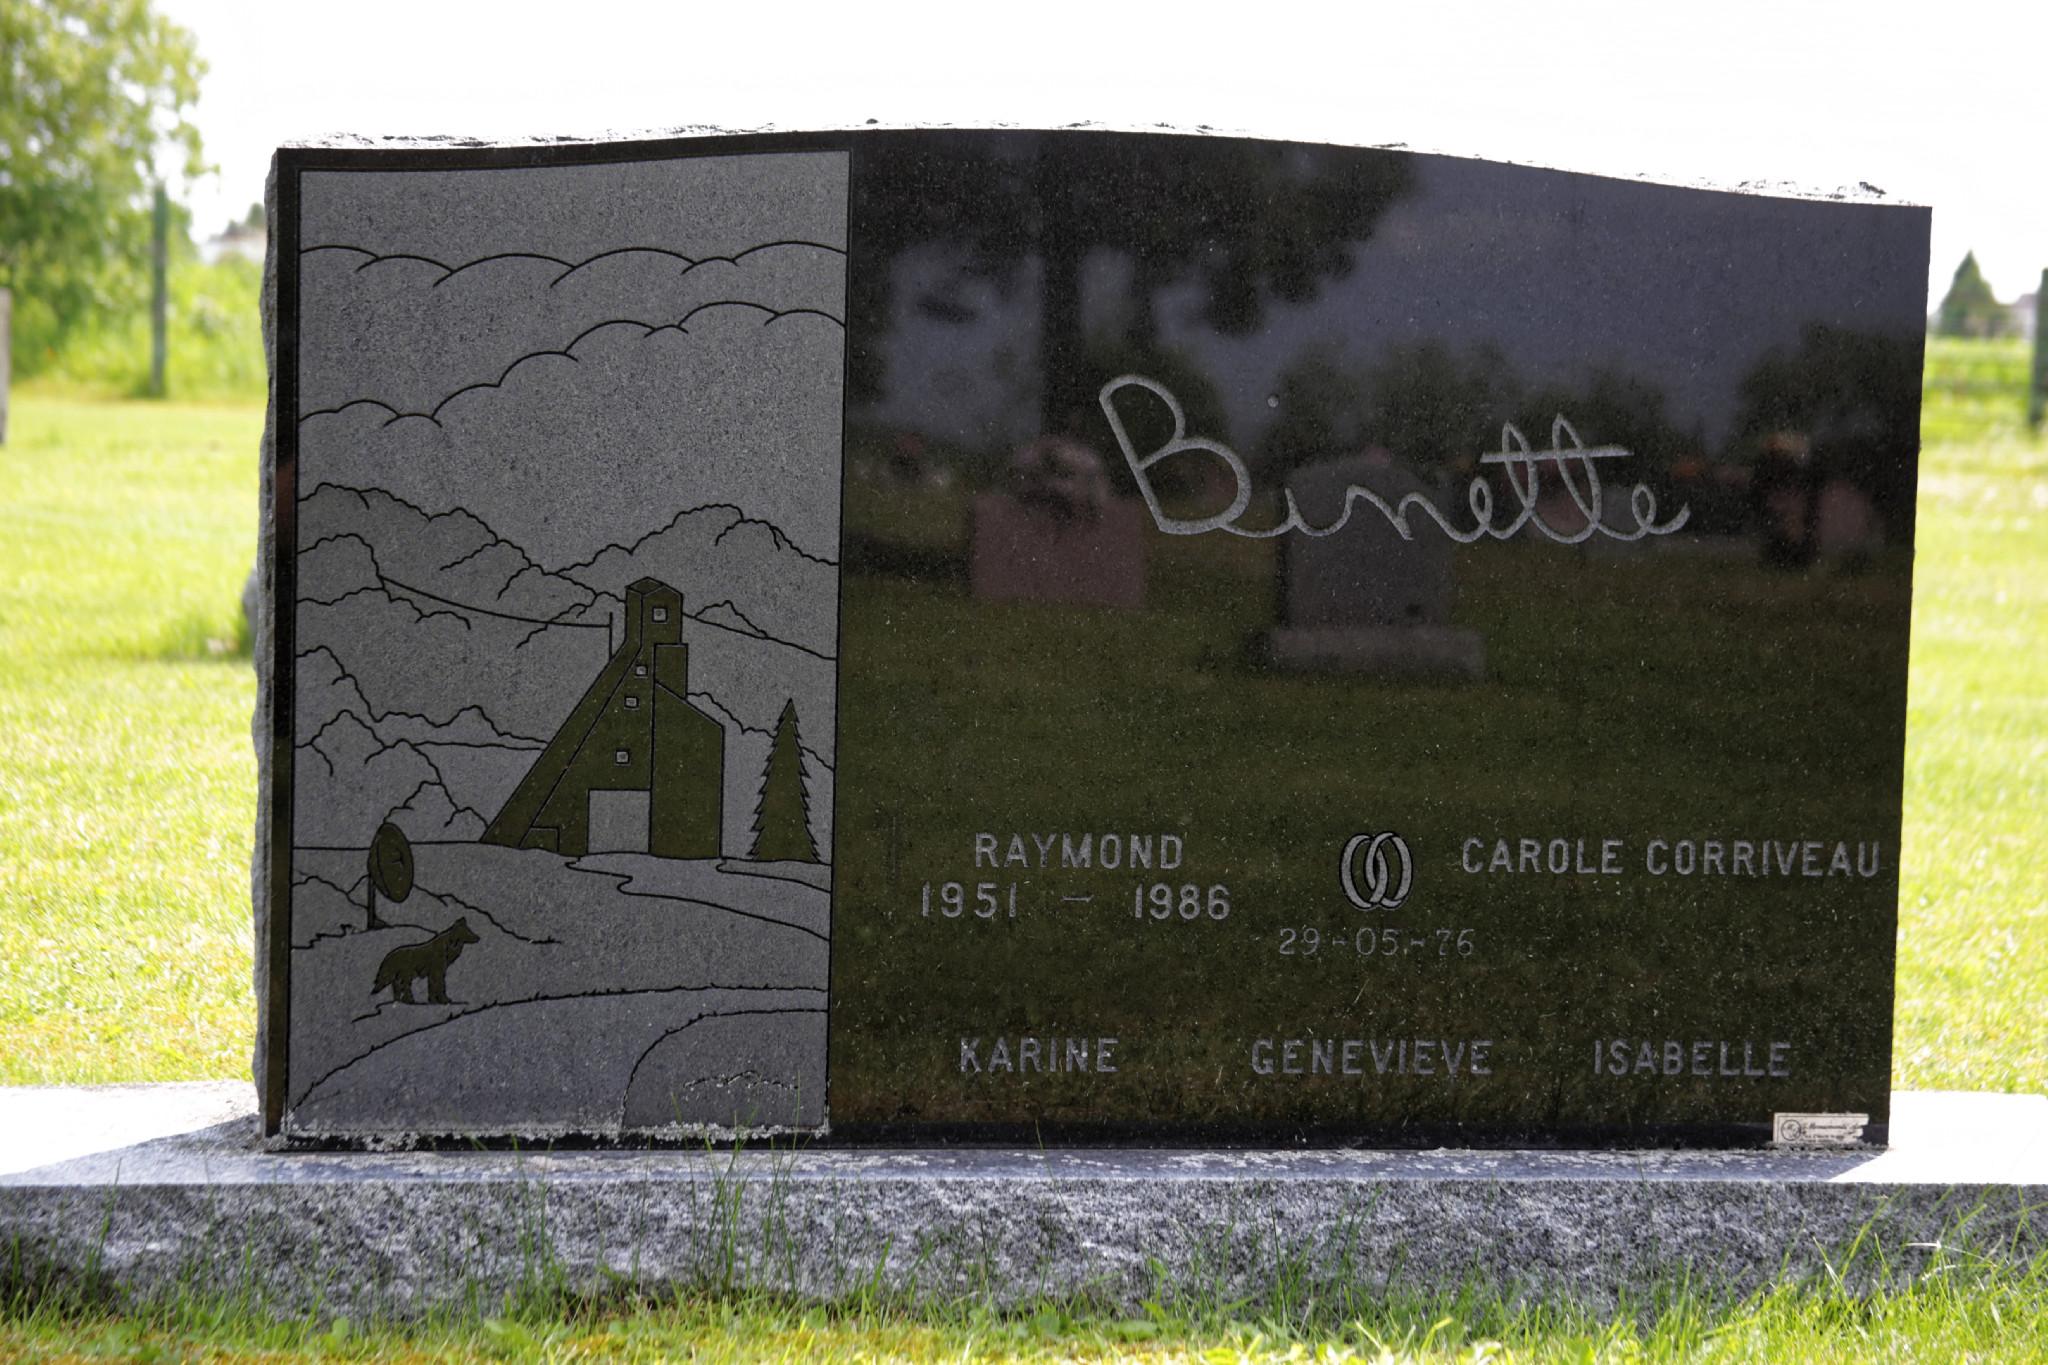 Raymond Binette